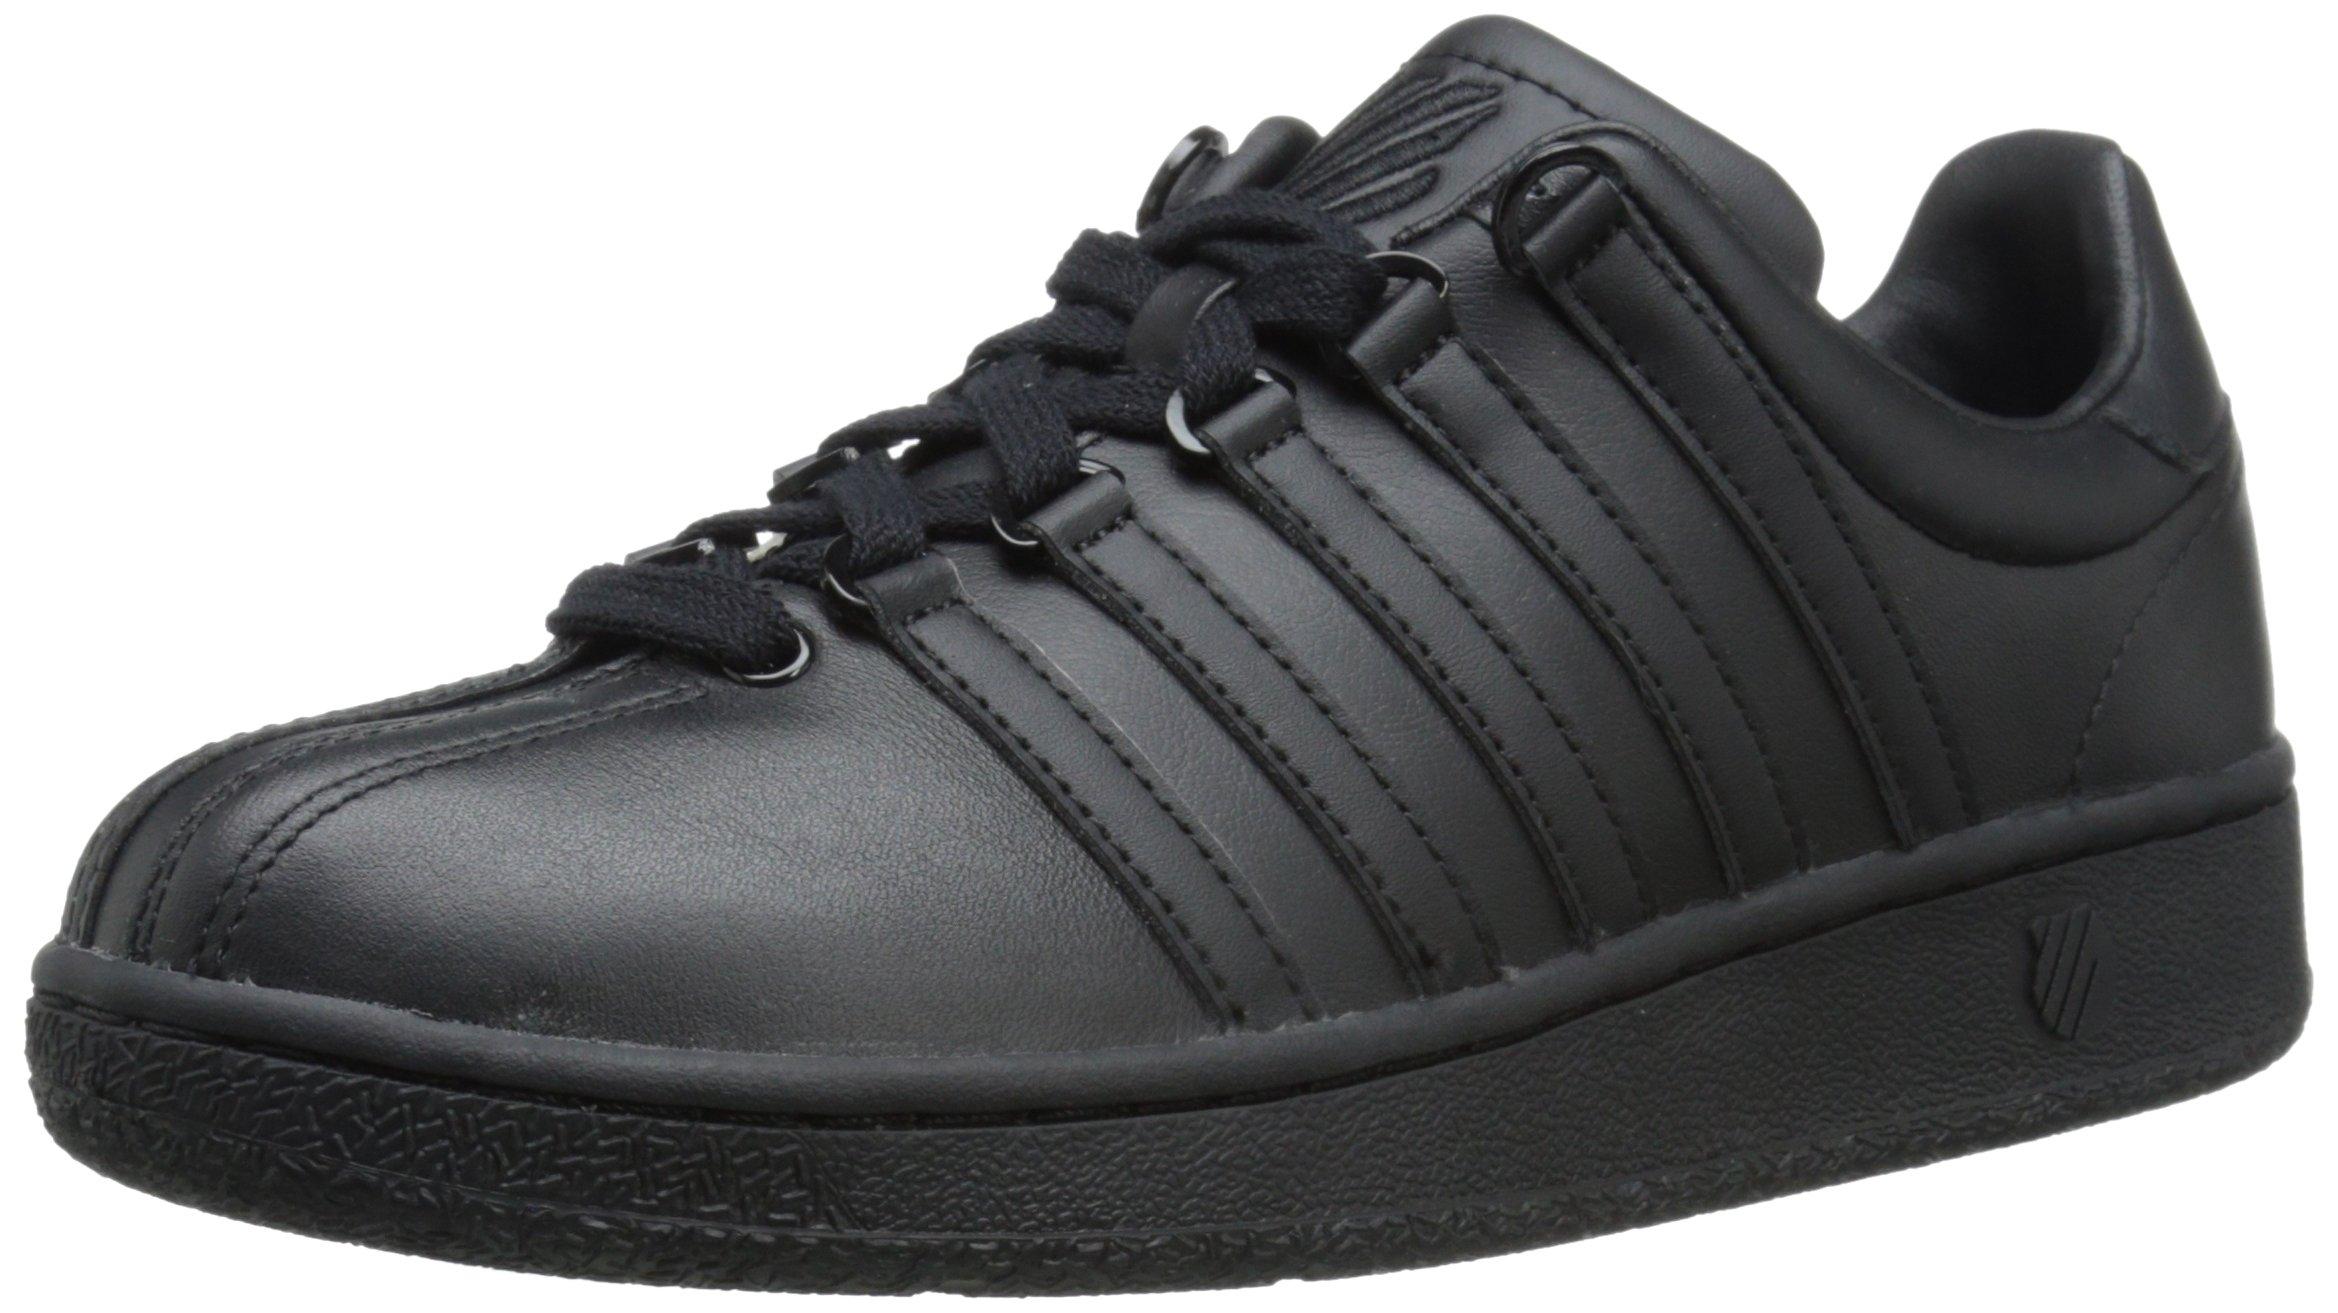 K-Swiss Women's Classic VN Fashion Sneaker, Black/Black, 8.5 M US